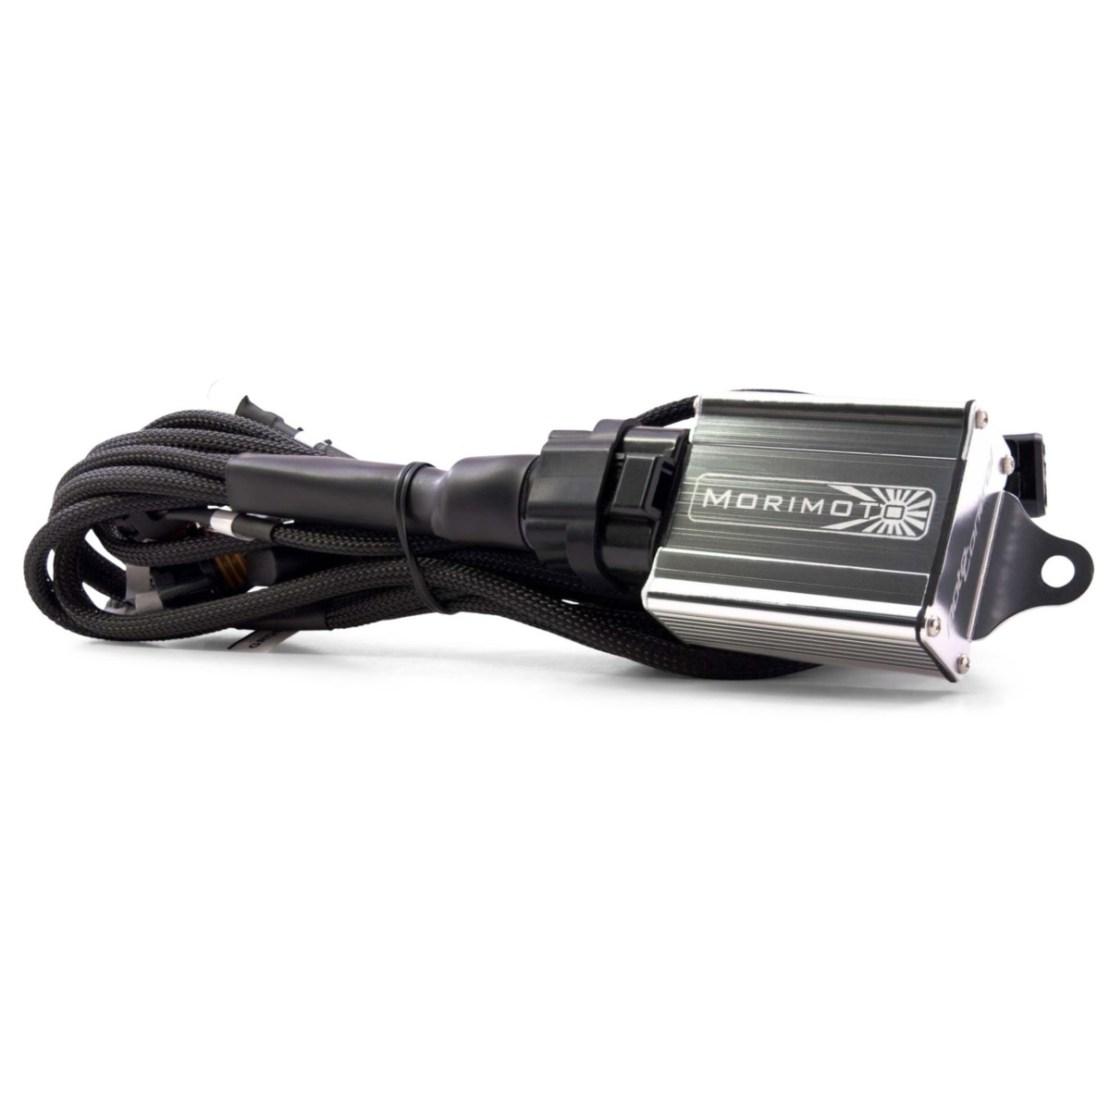 Morimoto 9004 9007 Bi Xenon Wiring Harness Hid Kit Pros Bmw Headlight Wire